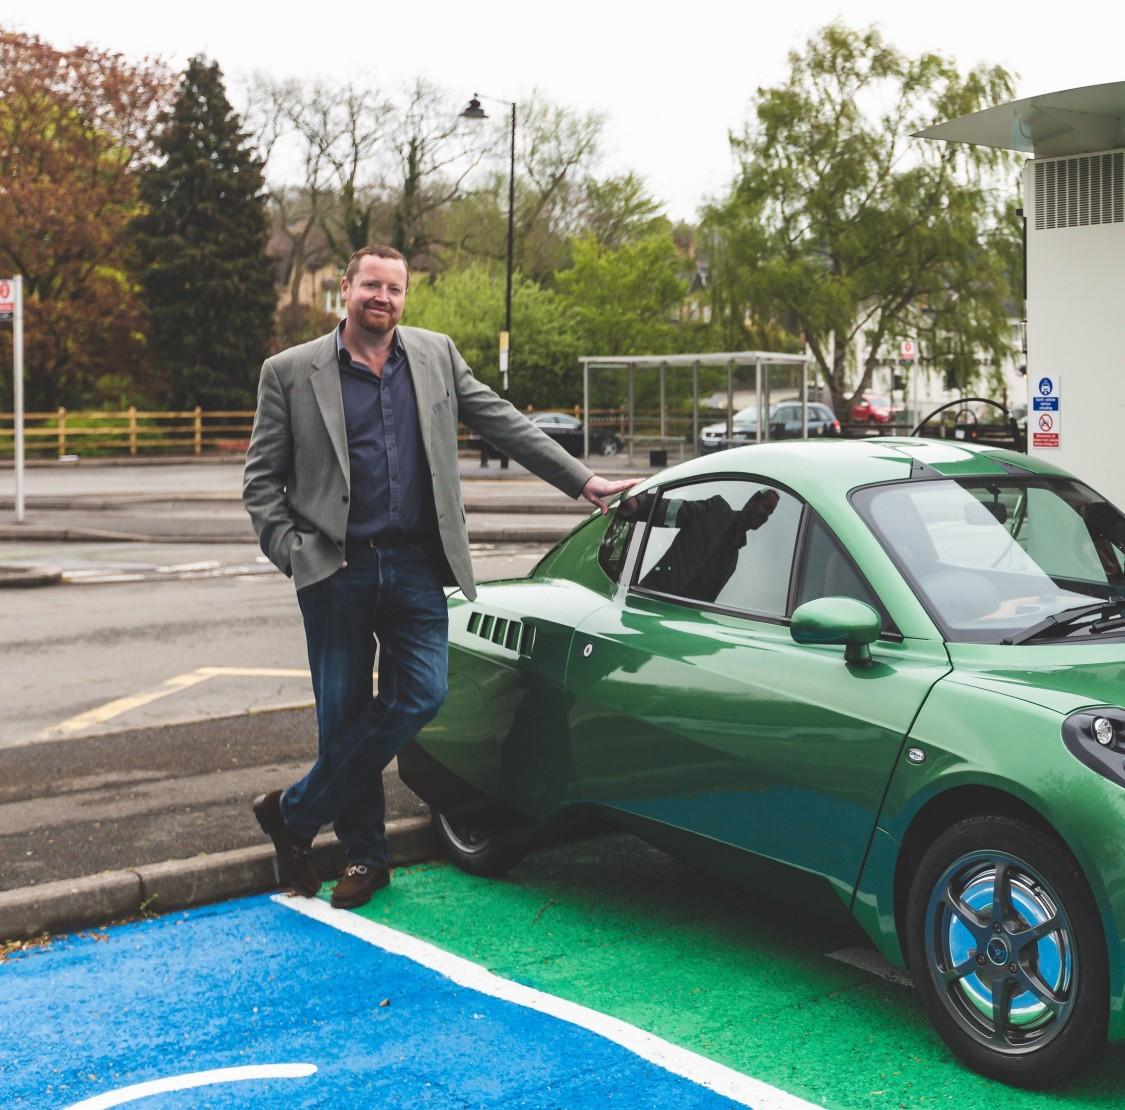 Chris Foxall with hydrogen powered Rasa car